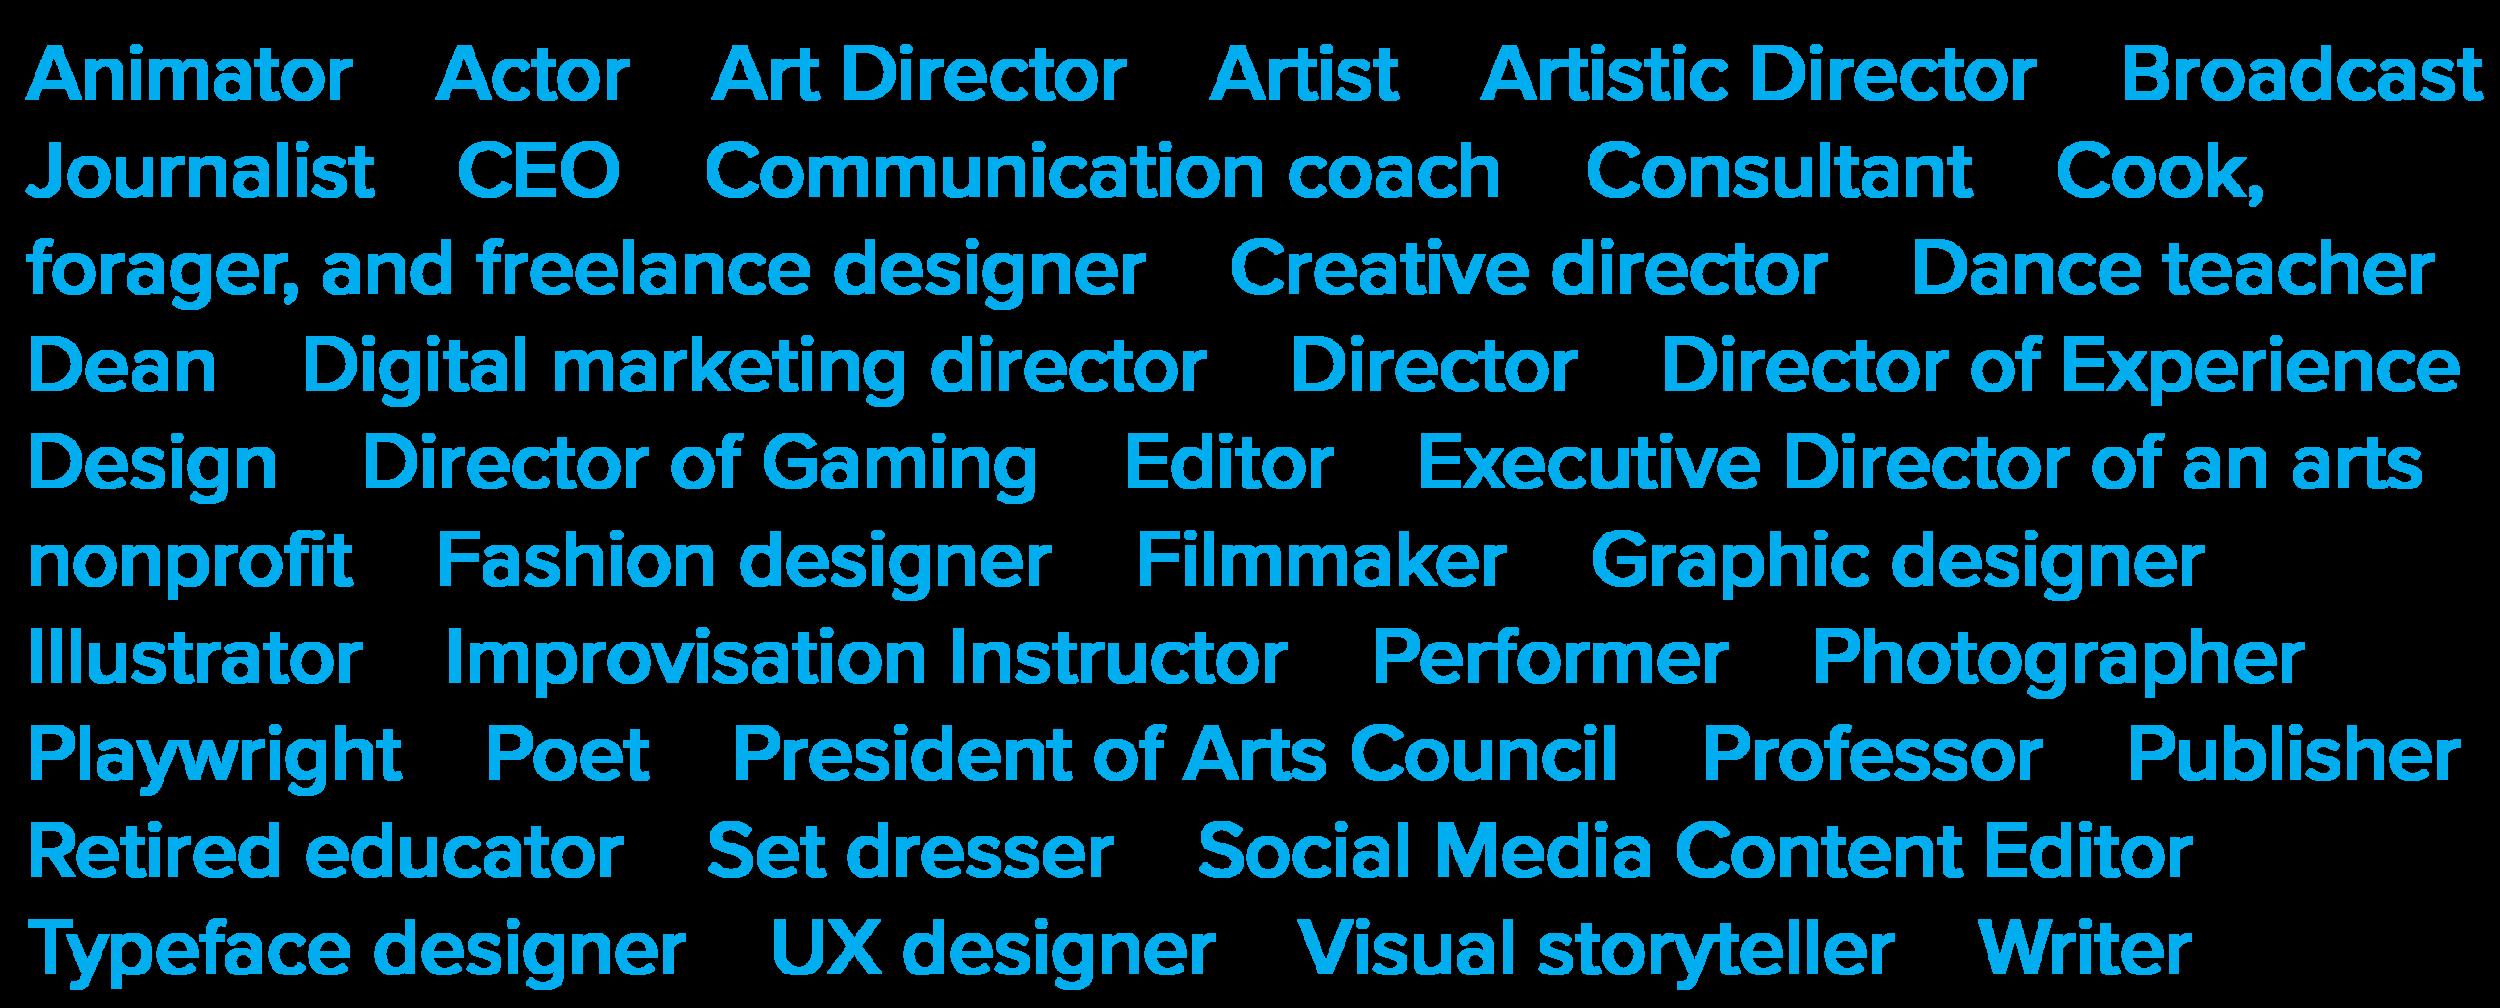 00_Roles_Creative_no title.png